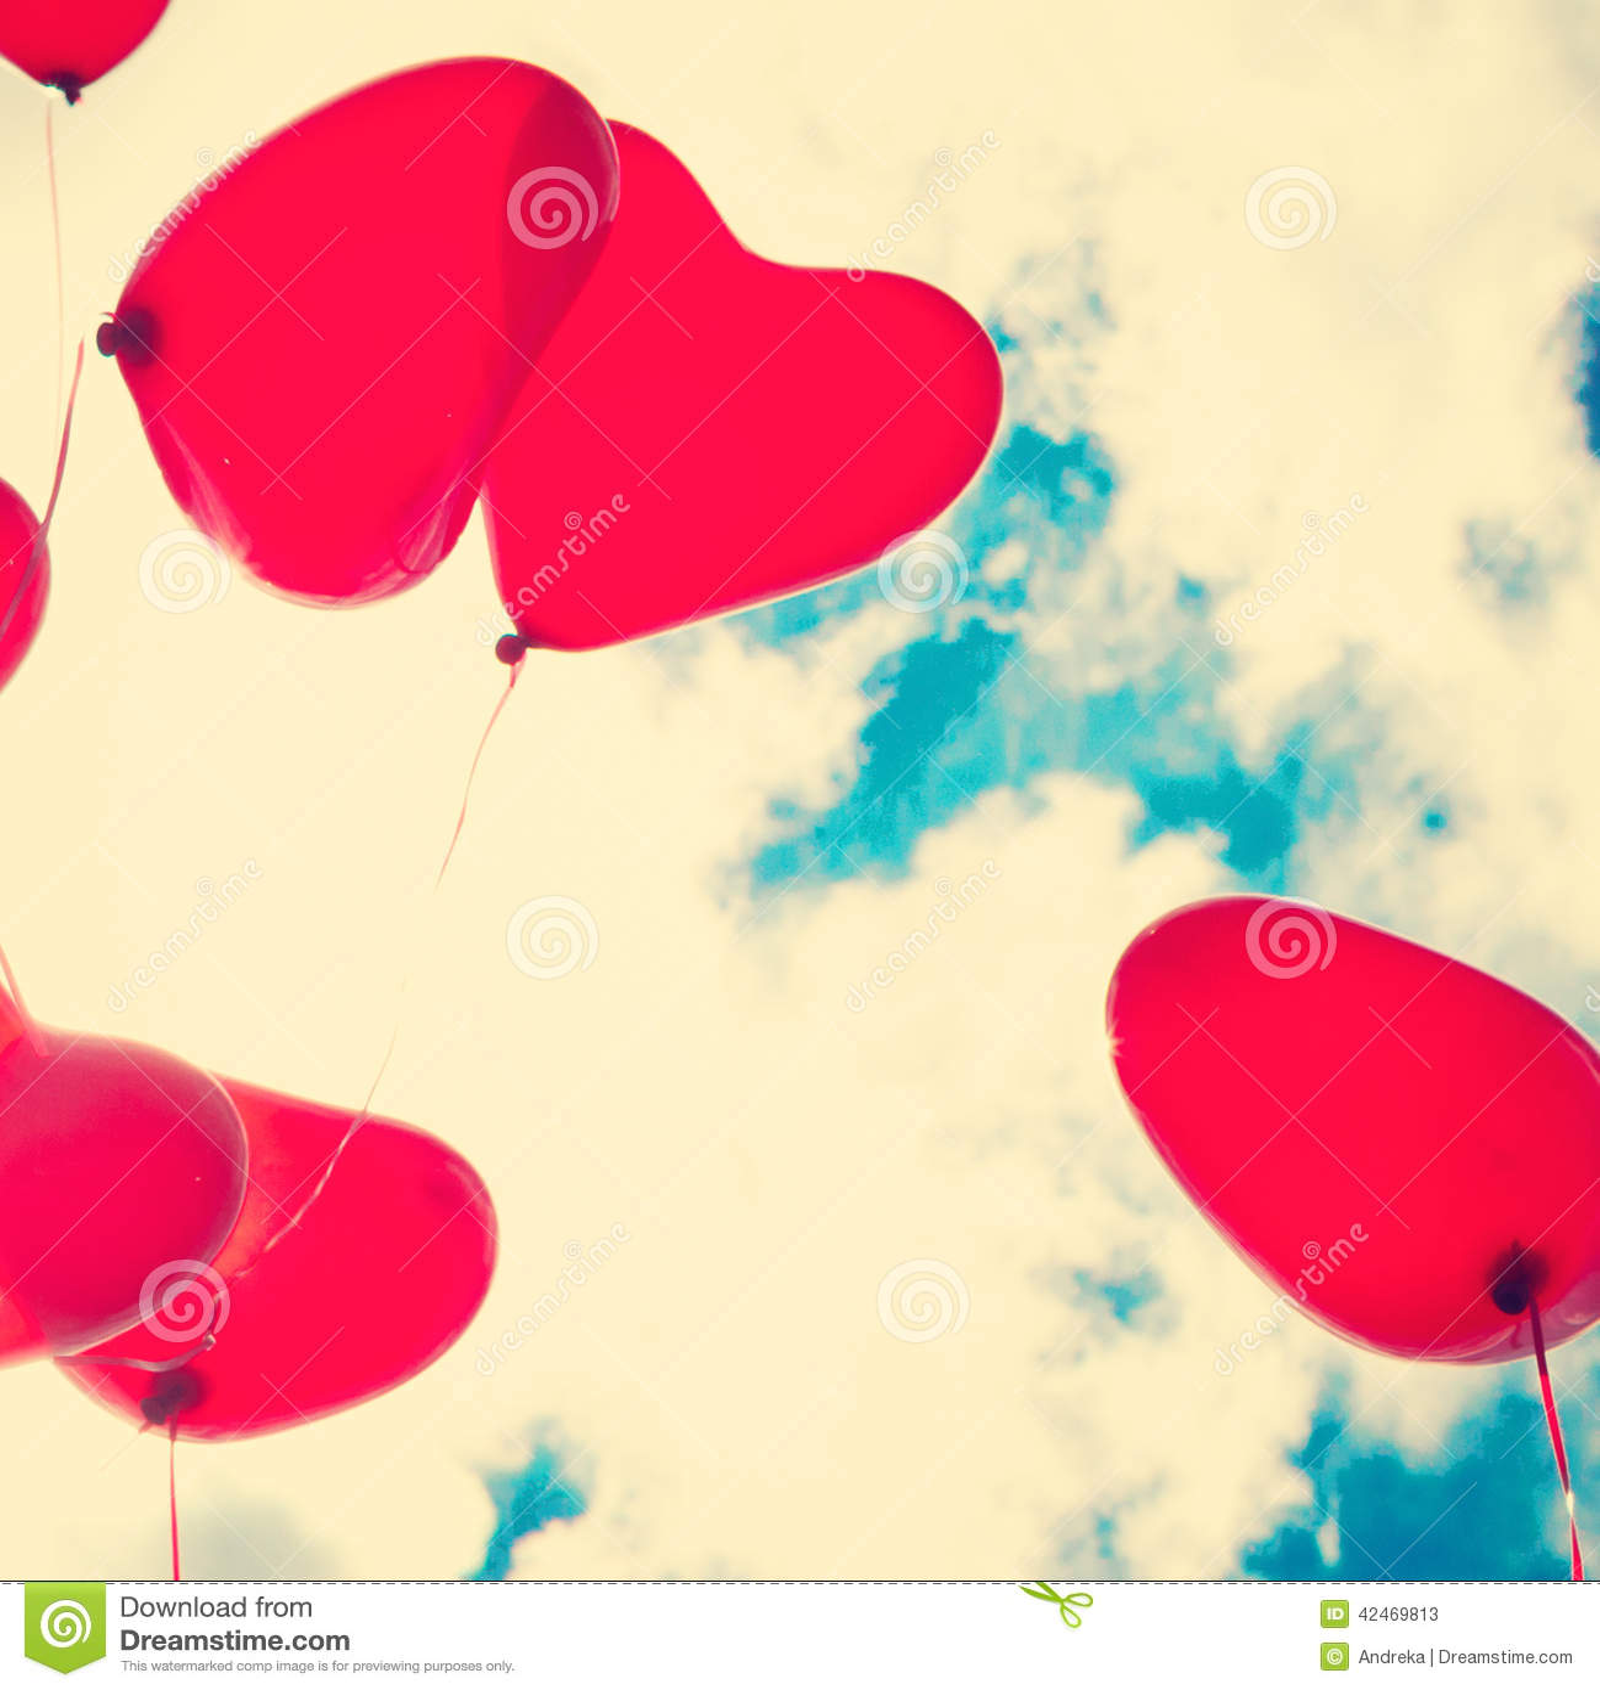 Rote Herz-förmige Ballone